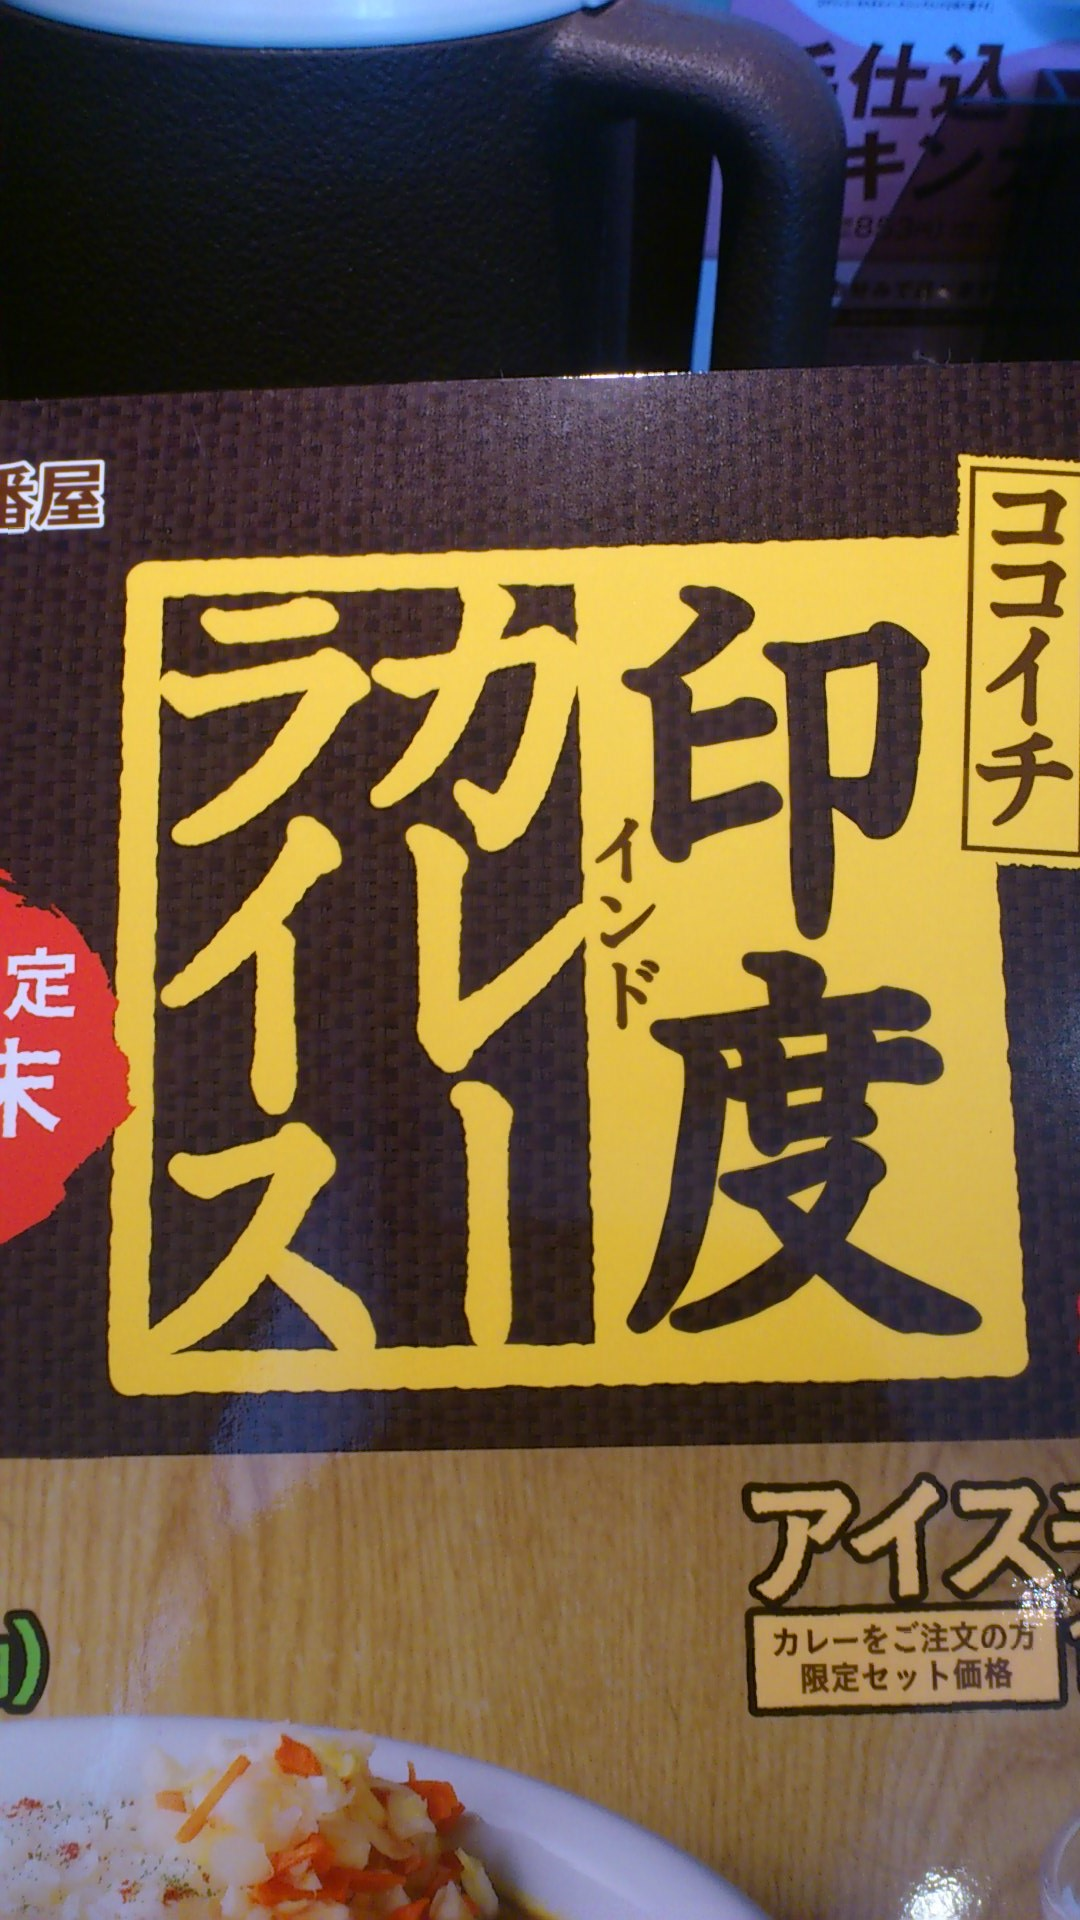 CoCo壱番屋 三郷彦成店